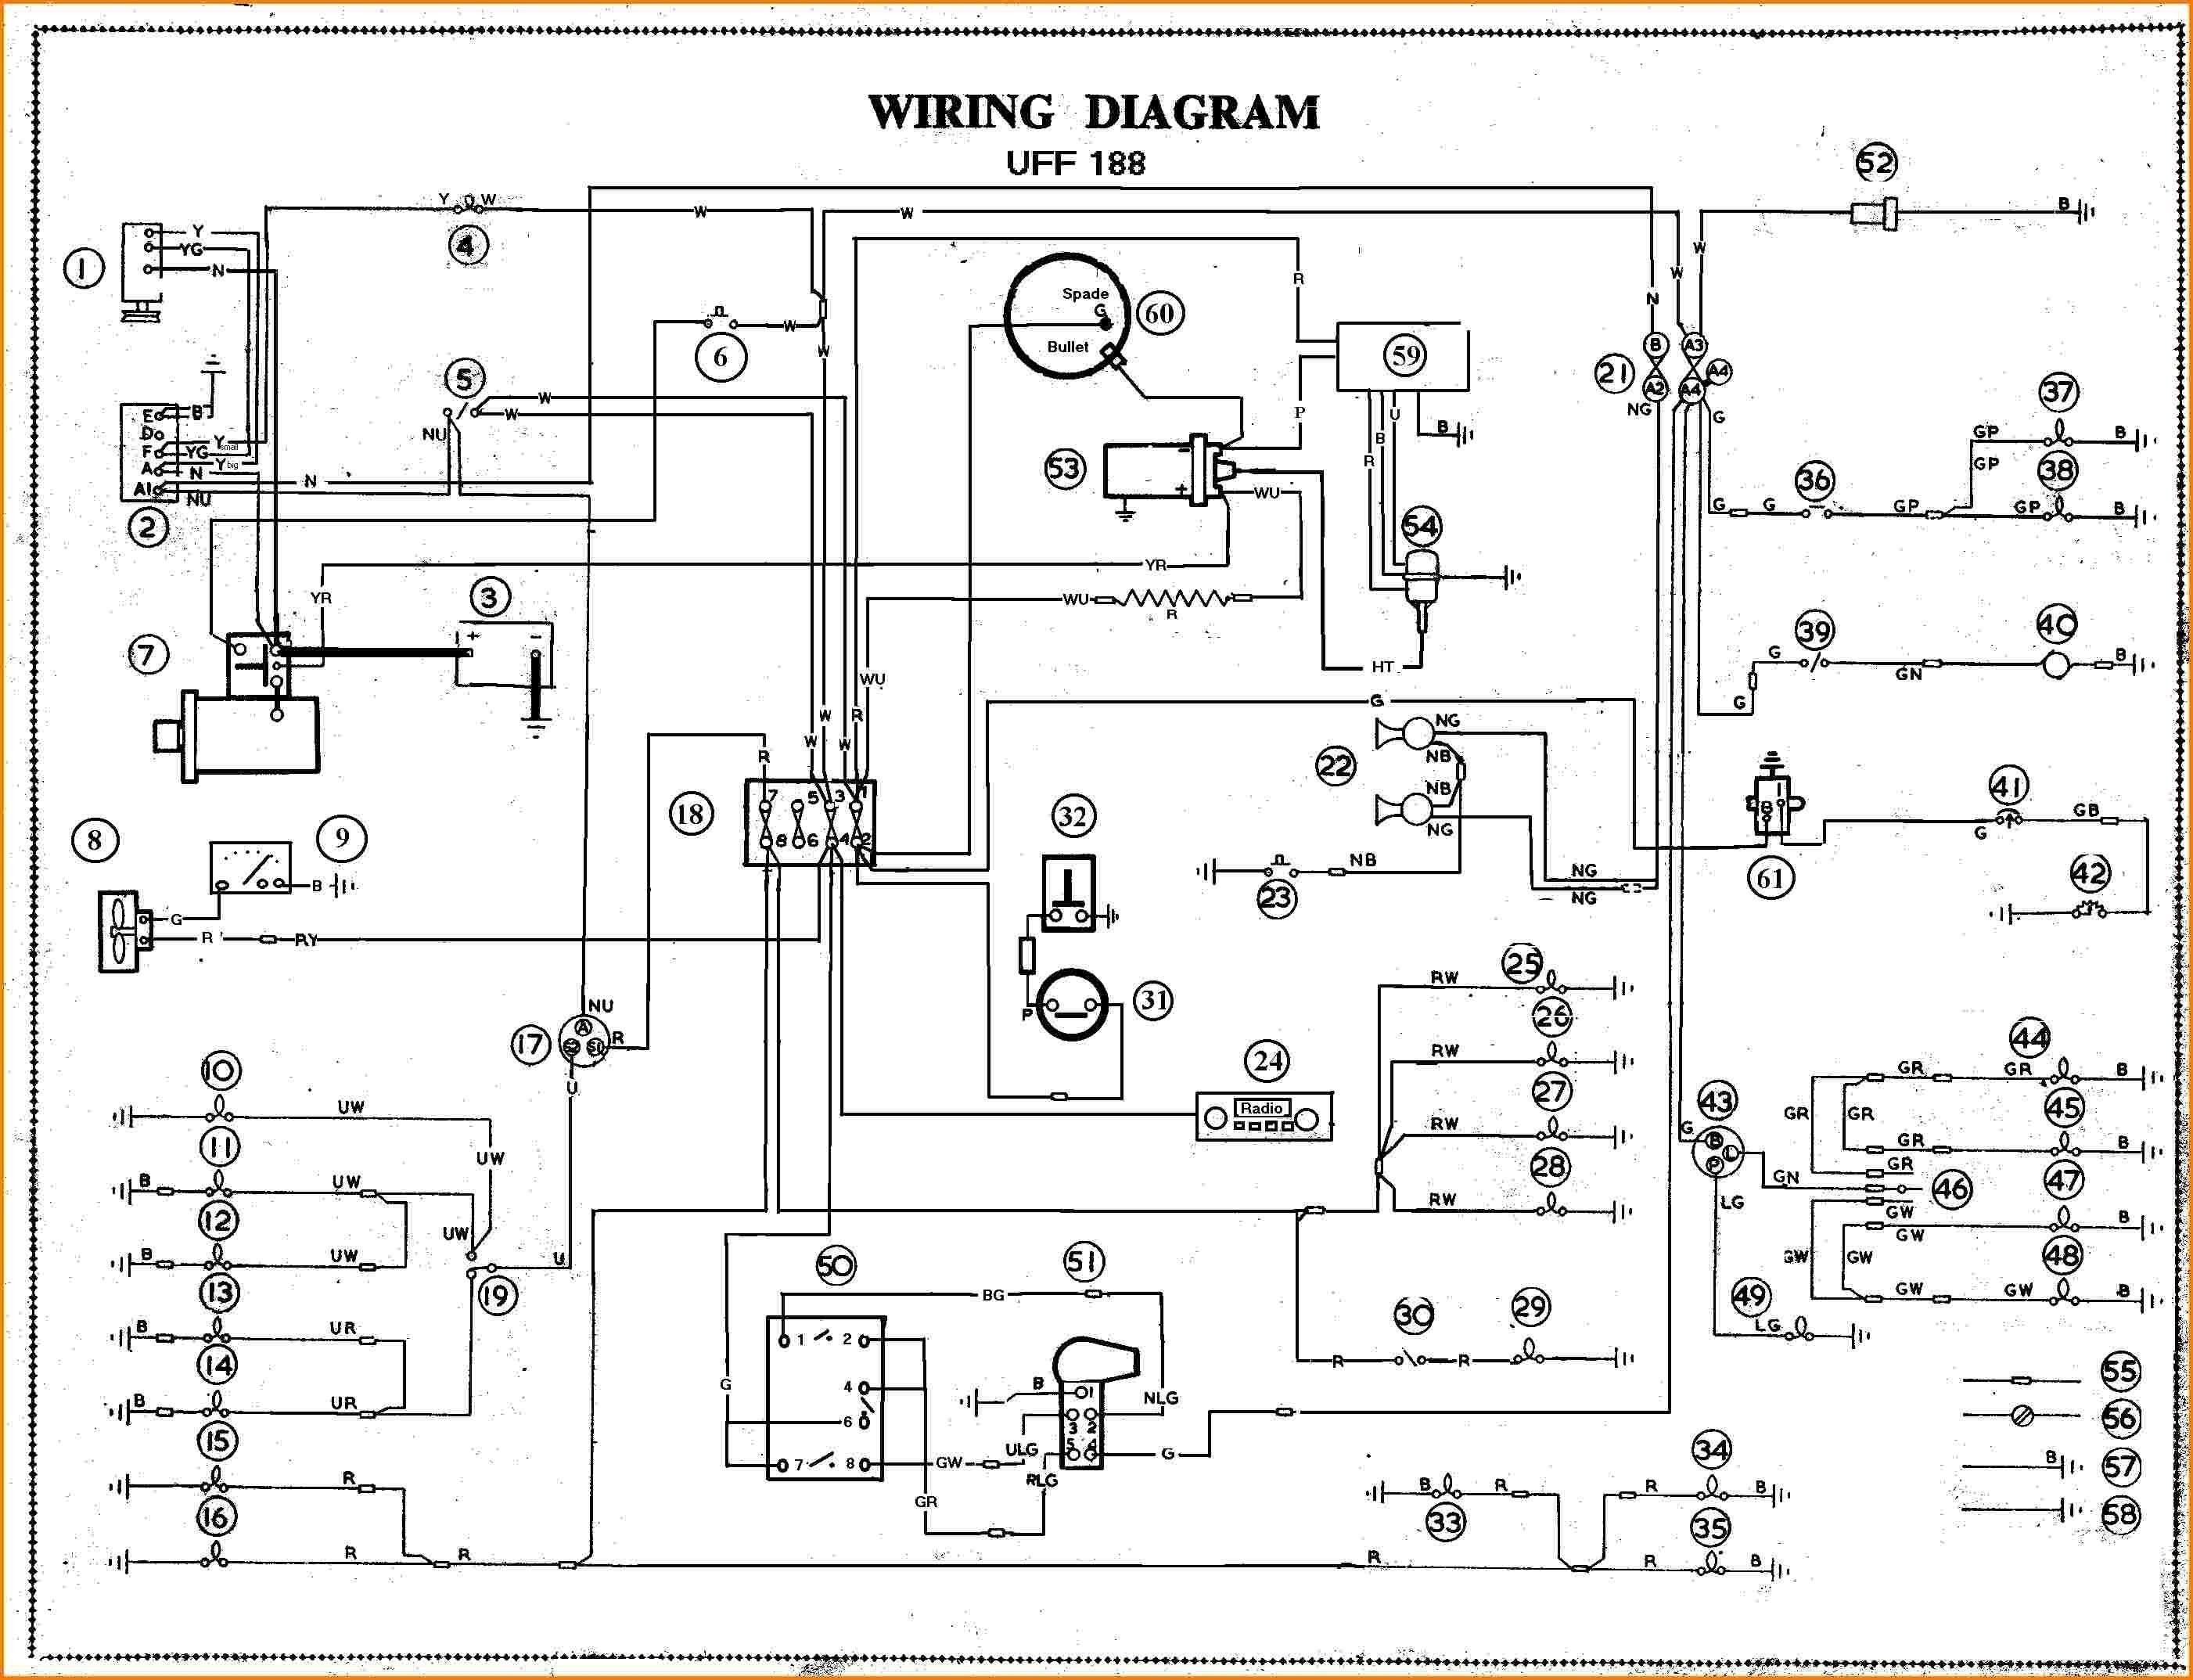 Unique Basic Wiring Diagram for Car Lights | Electrical wiring diagram, Electrical  diagram, Trailer wiring diagram | Gem Car Wiring Diagram 99 |  | Pinterest